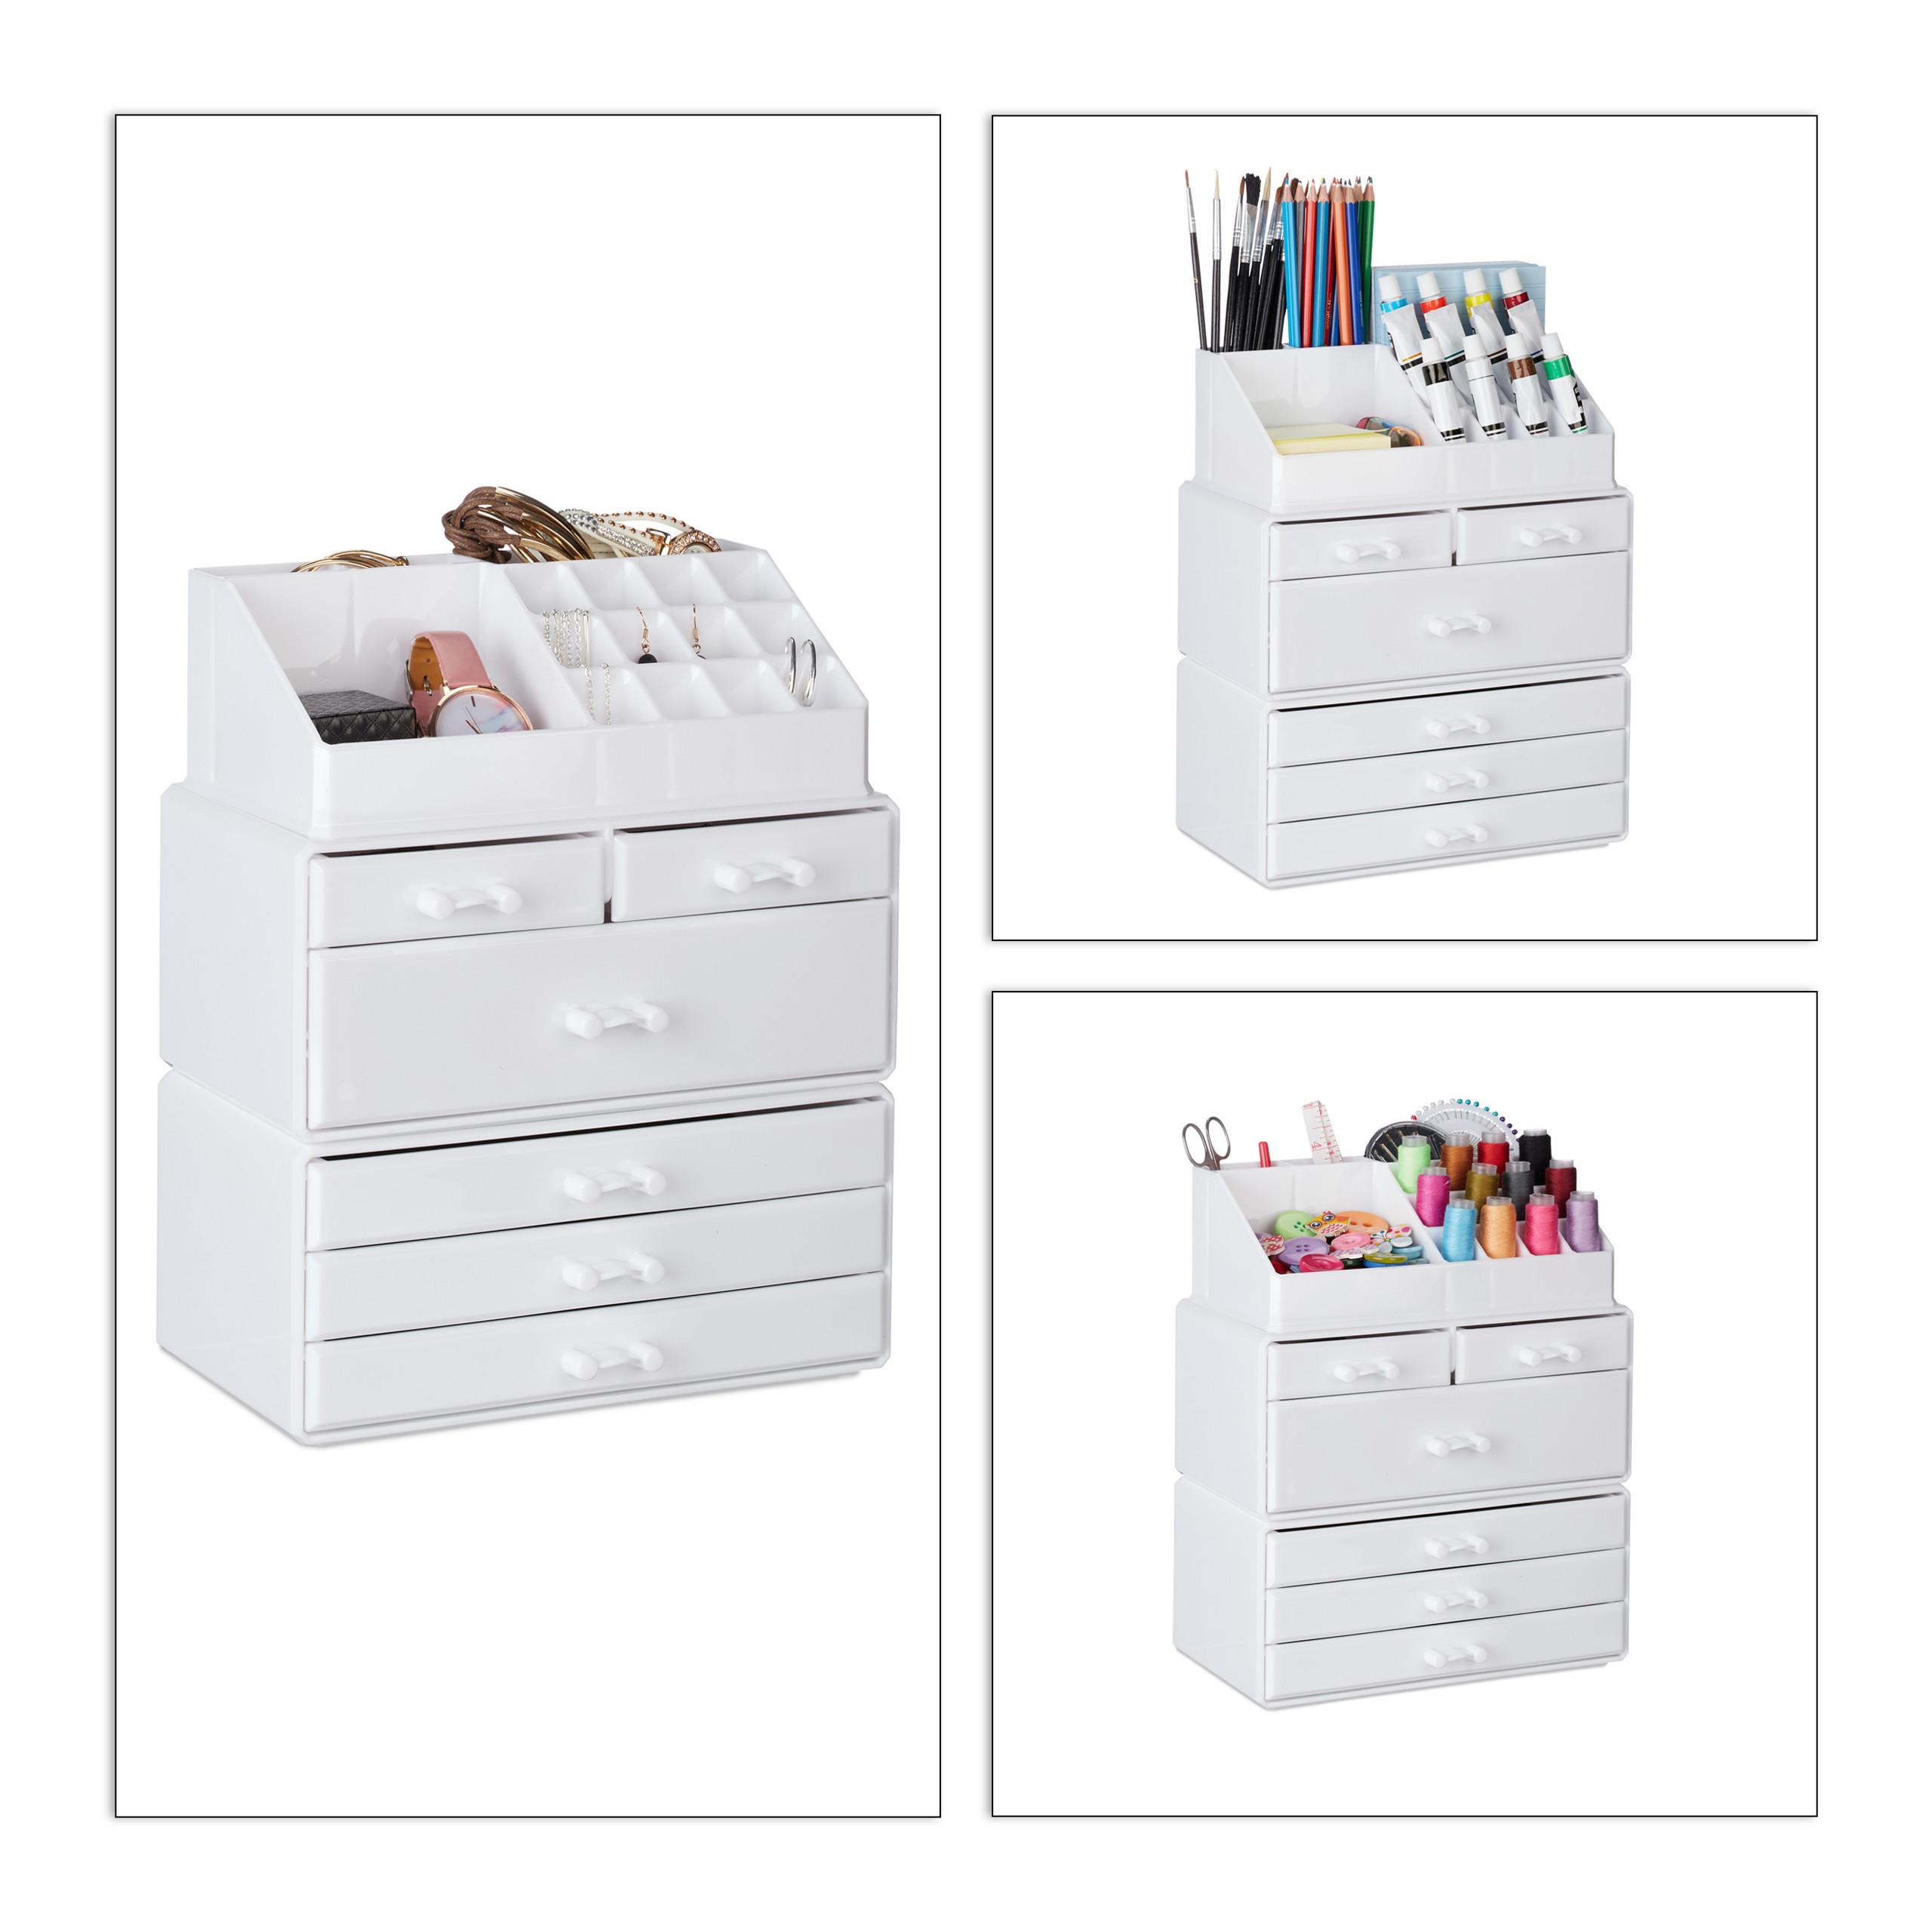 make-up-organizer-met-6-lades-acryl-cosmeticahouder-make-up-cosmetica-opslag miniatuur 20